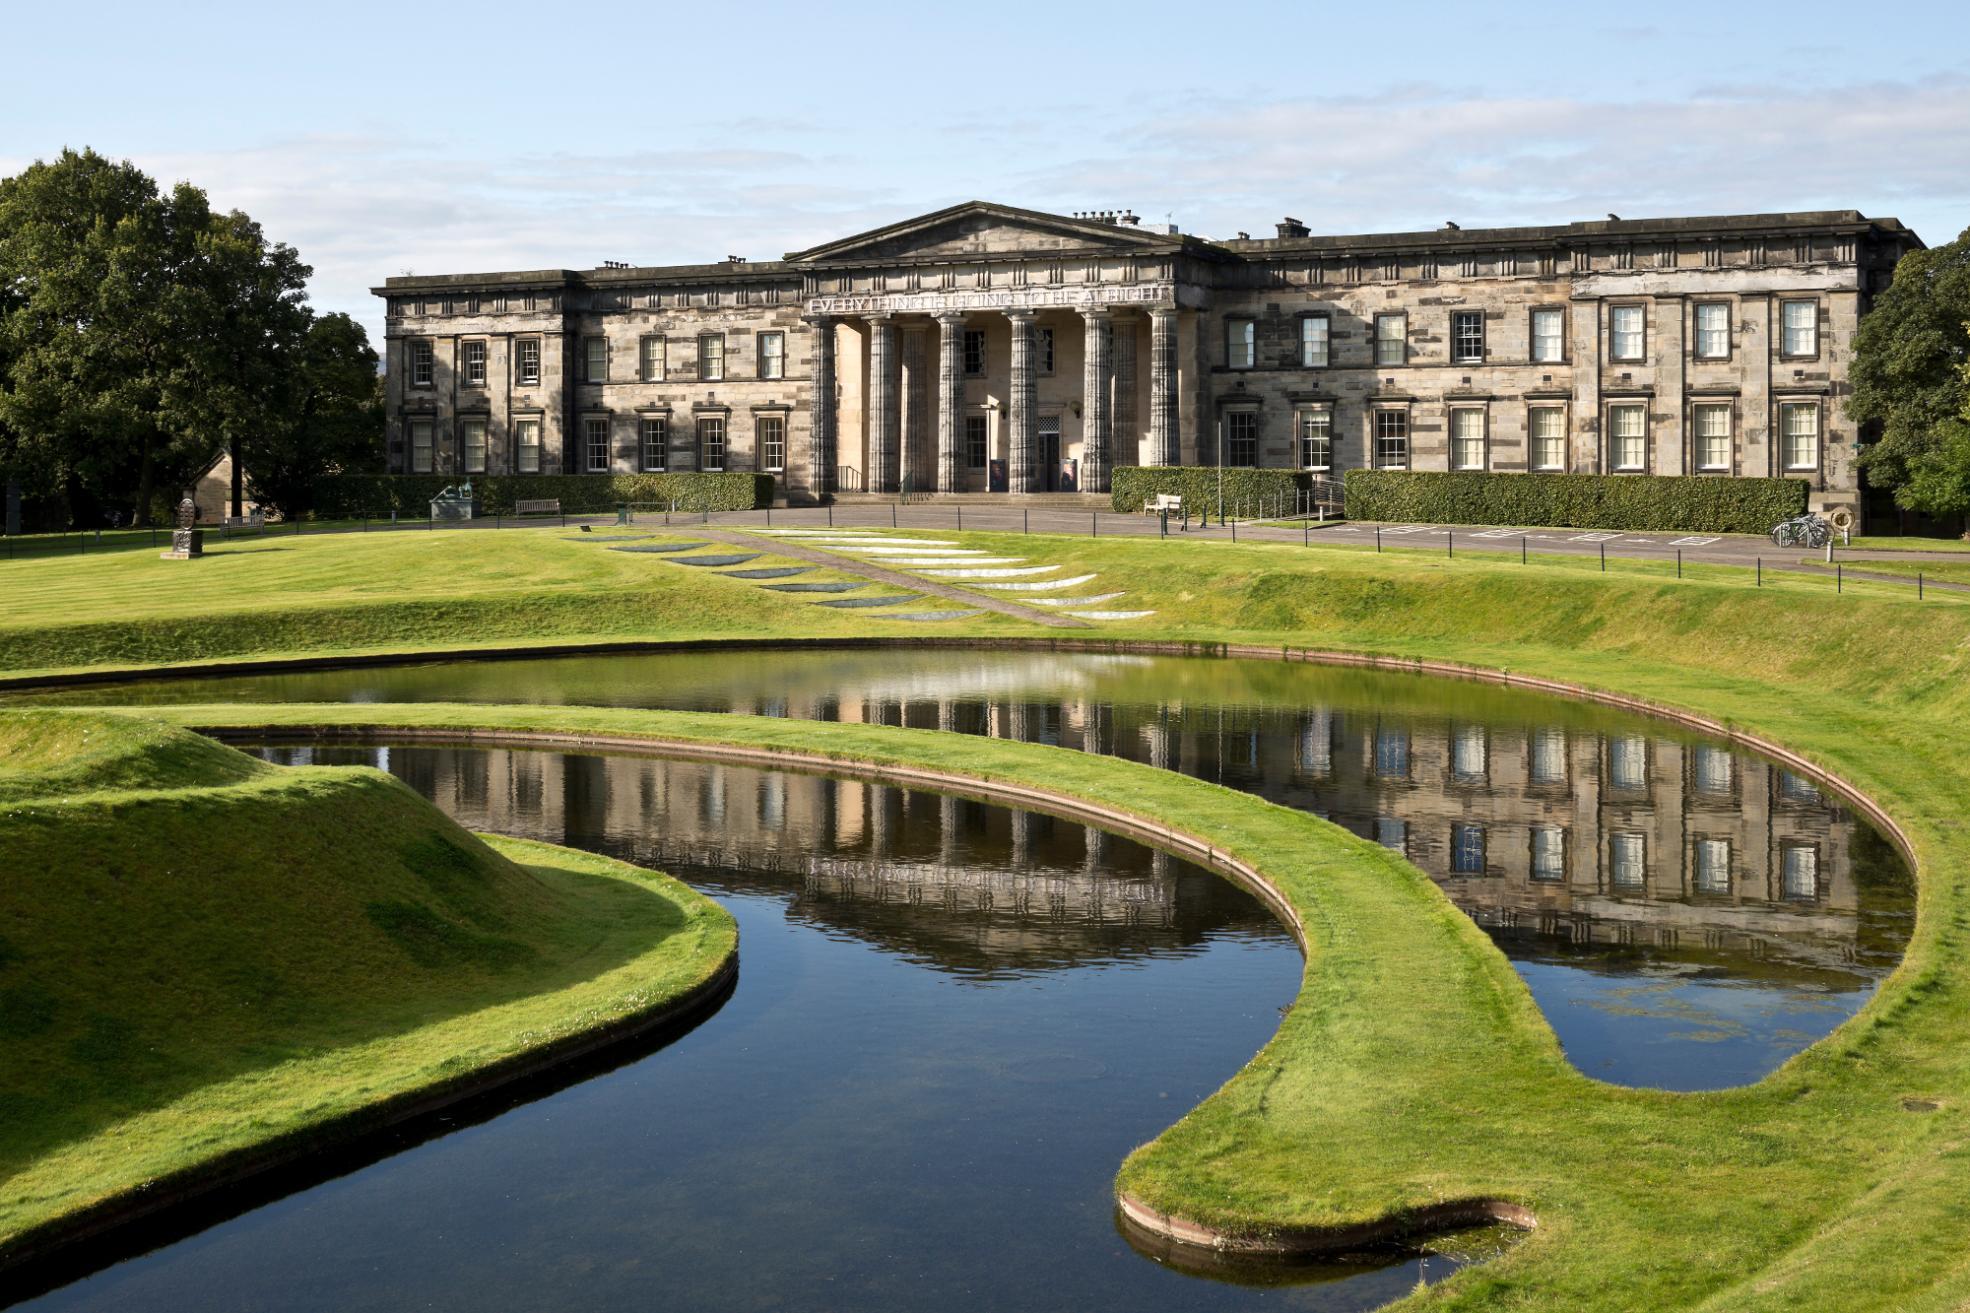 Edinburgh Scottish Gallery of Modern Art